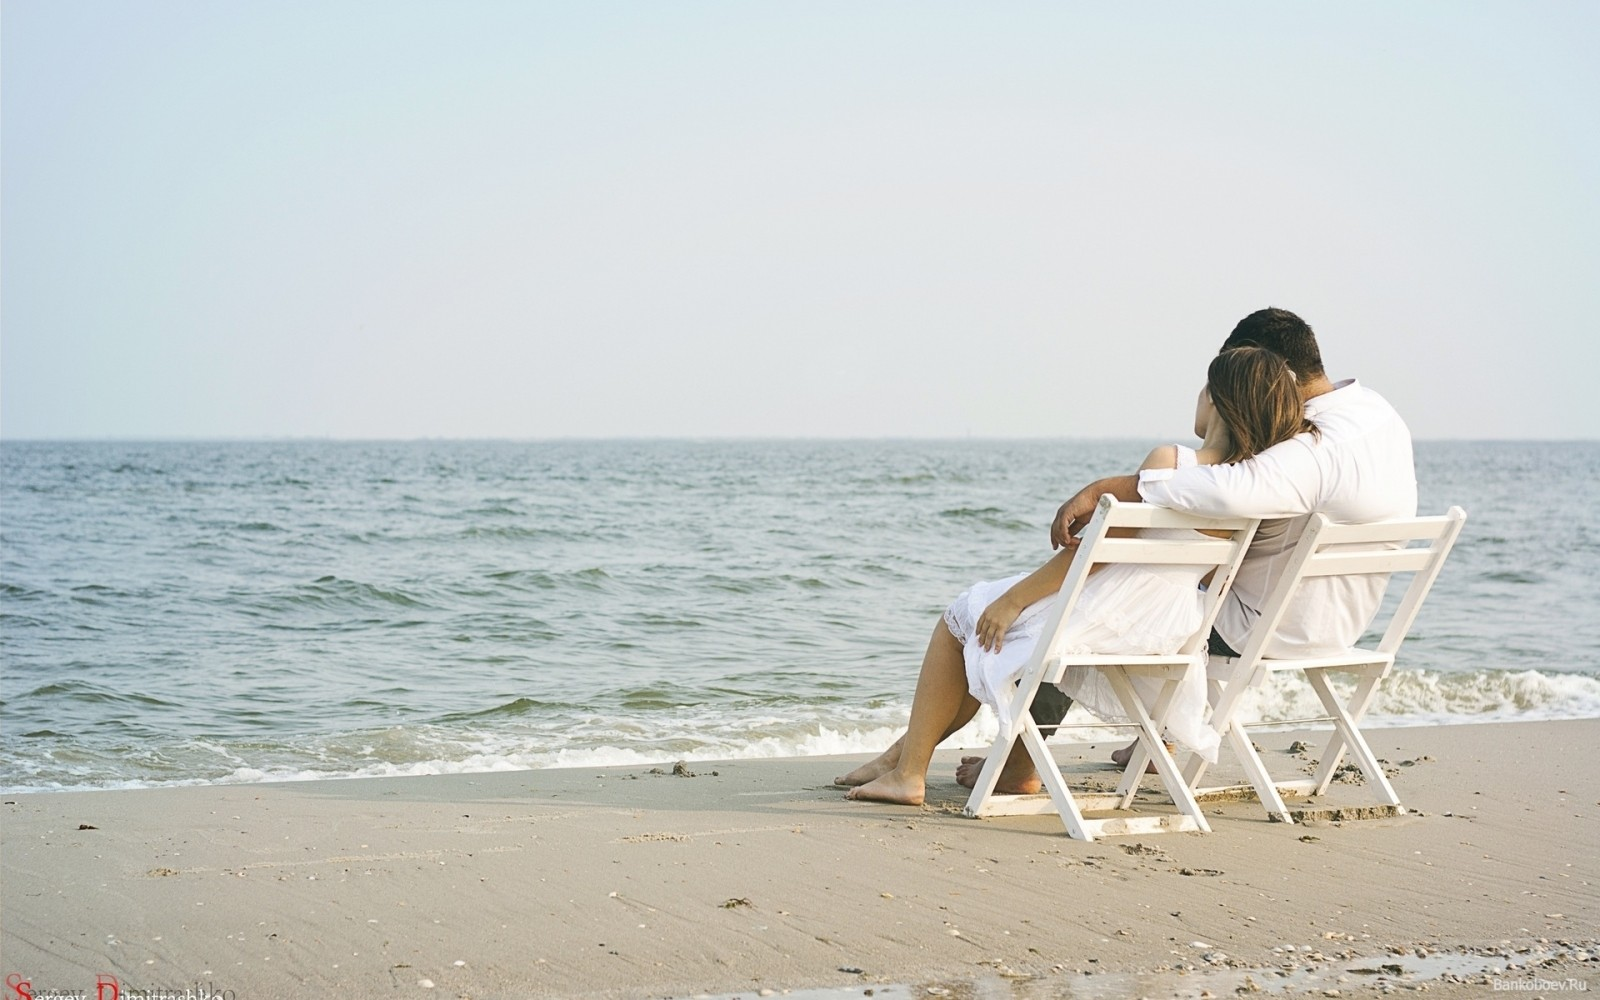 couple-love-romantic-sea-beach-relax-seaside